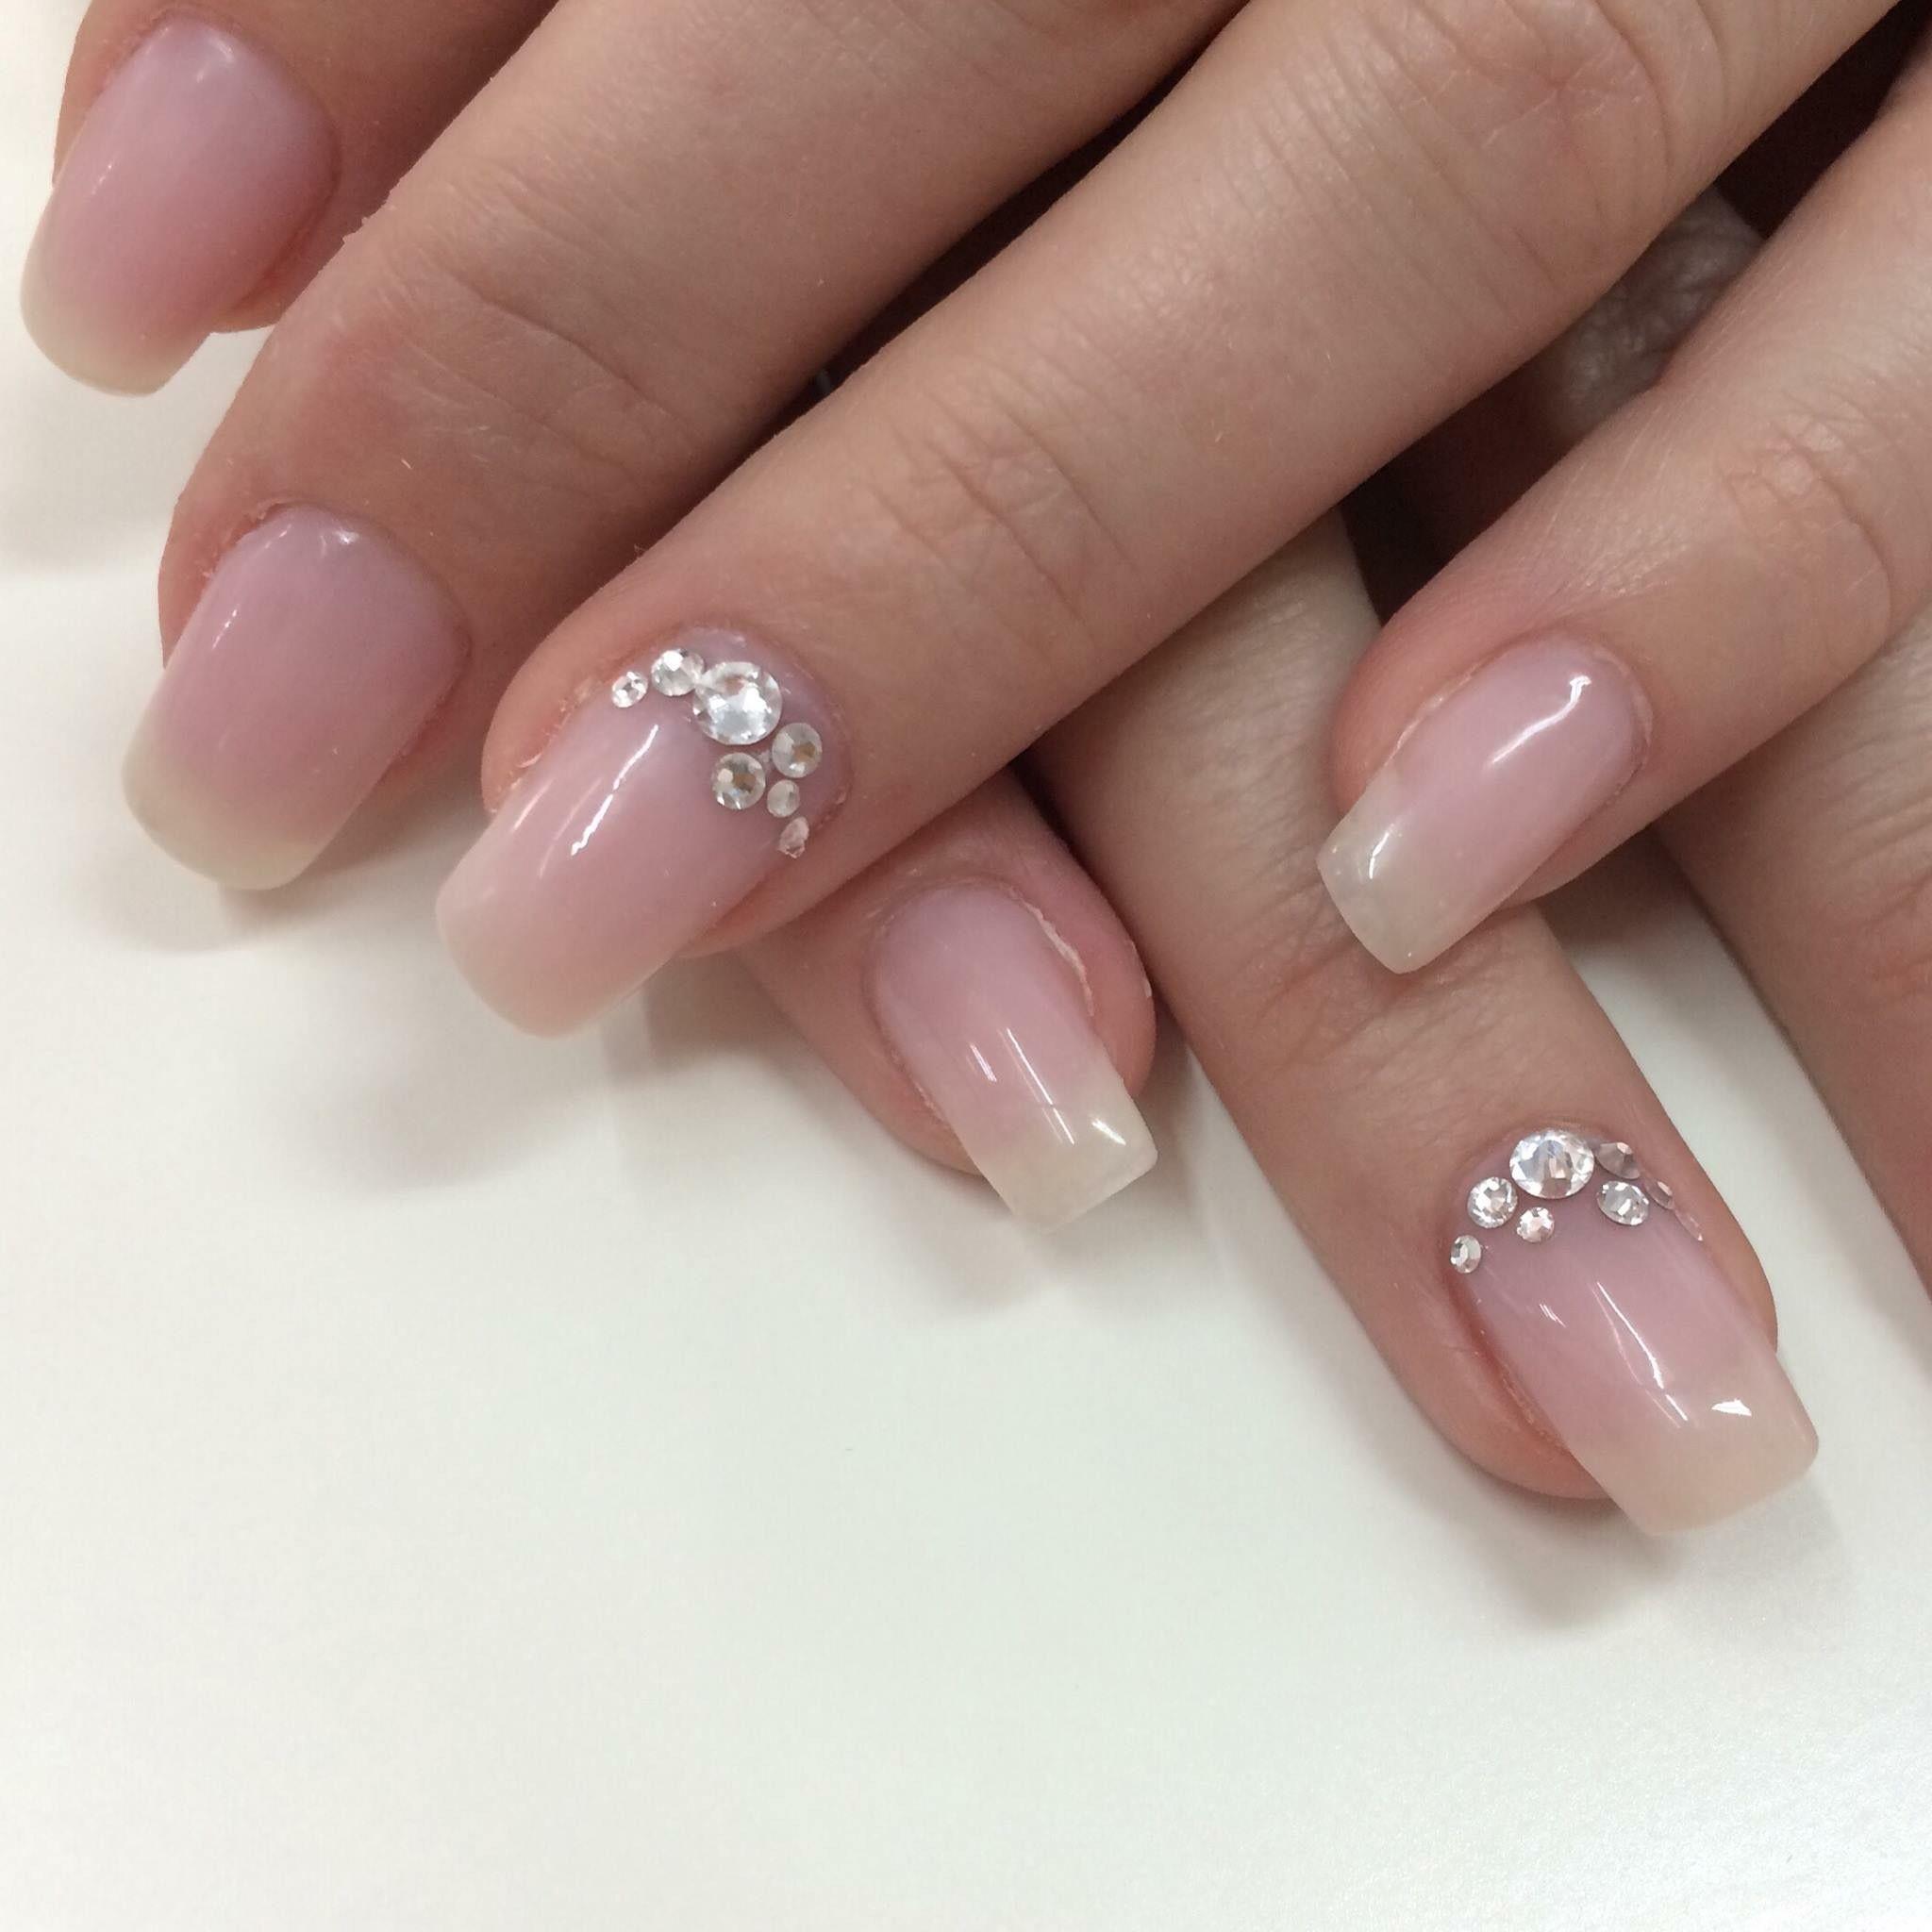 Ongles au gel. Ongles pastels. Ongles roses. Diamants Swarovski ...